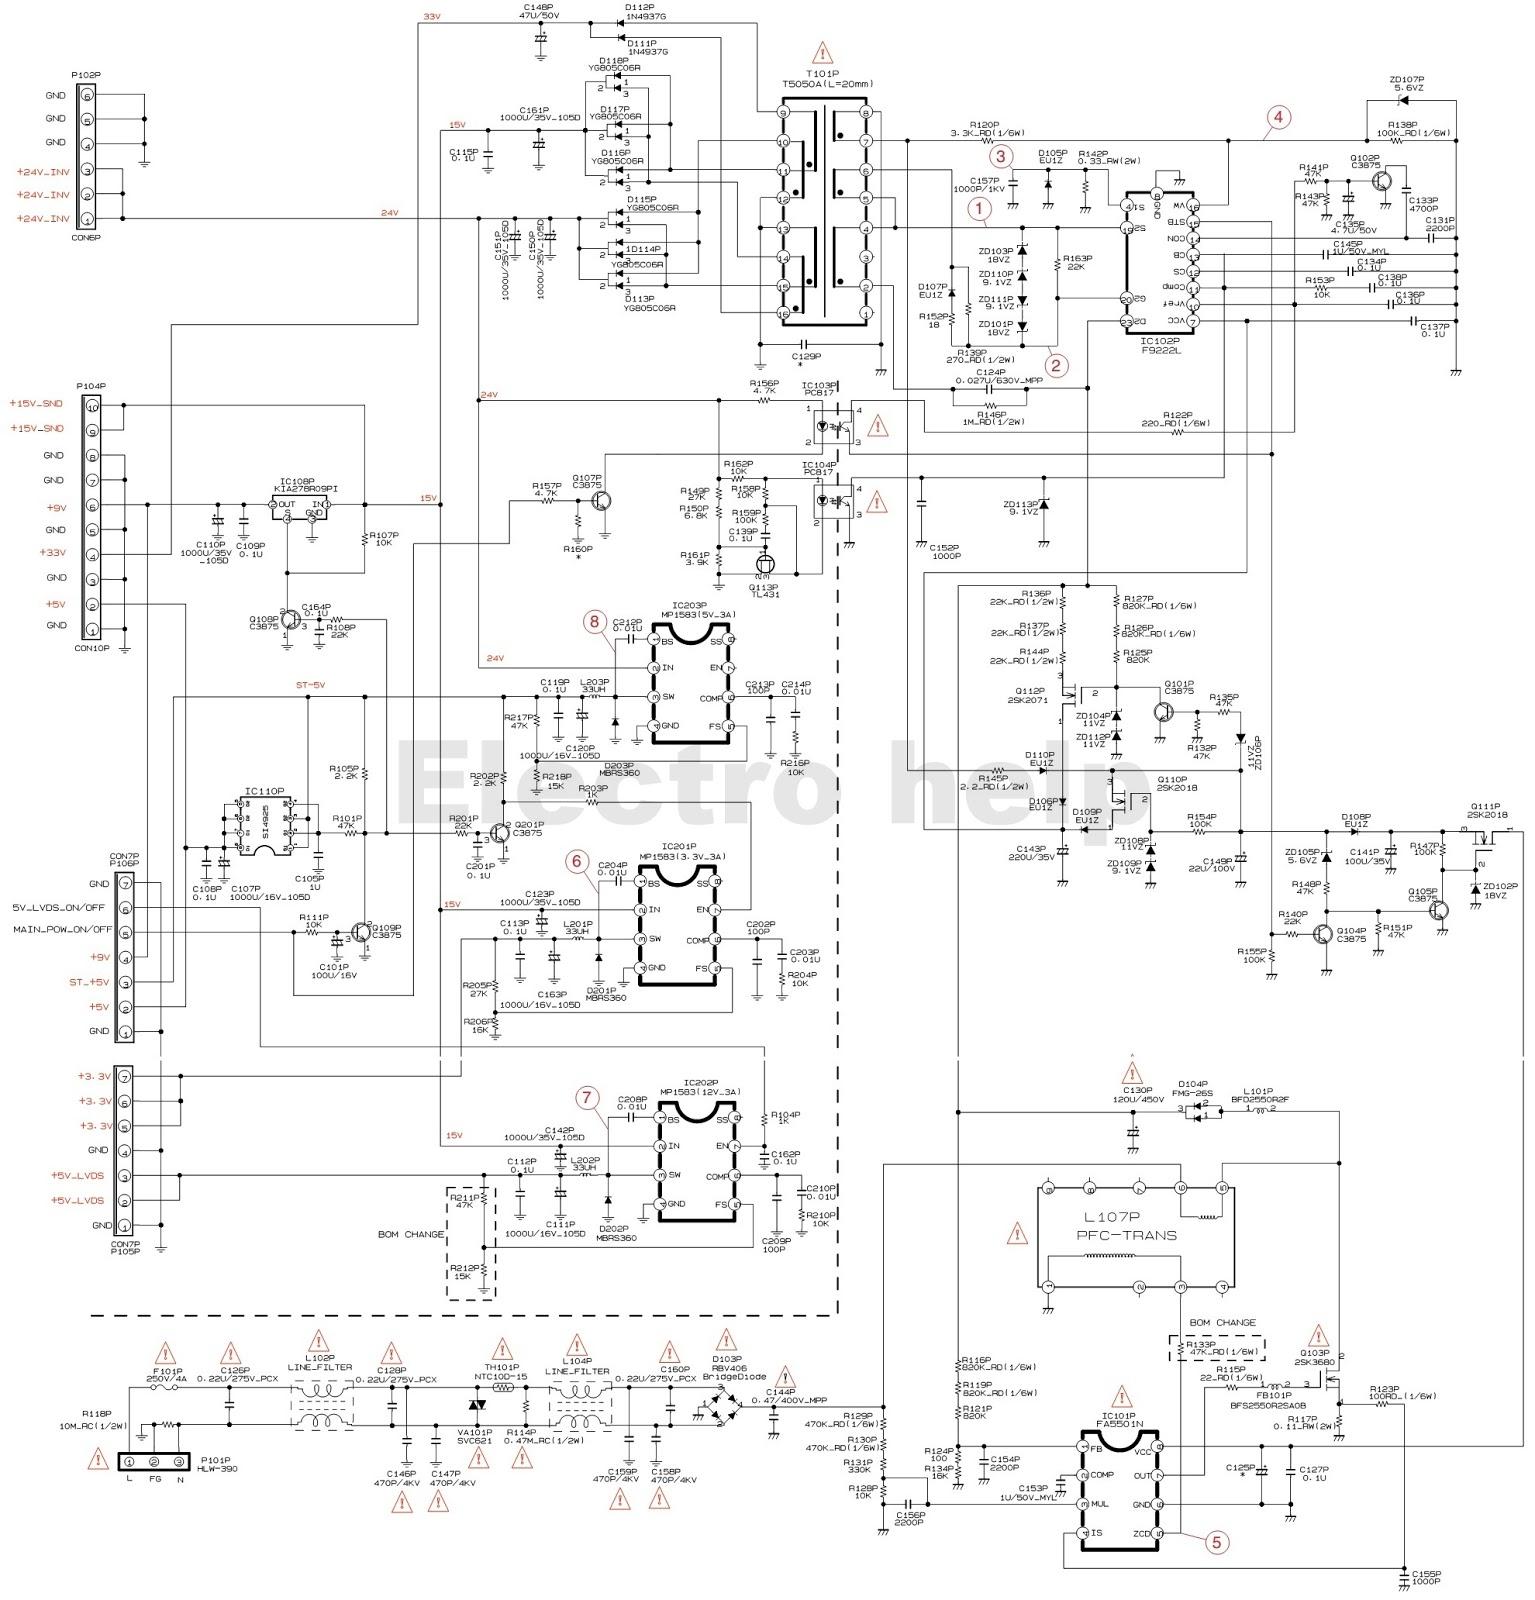 hight resolution of john deere 245 wiring diagram wiring schematic diagram 94john deere 245 wiring diagram wiring library john